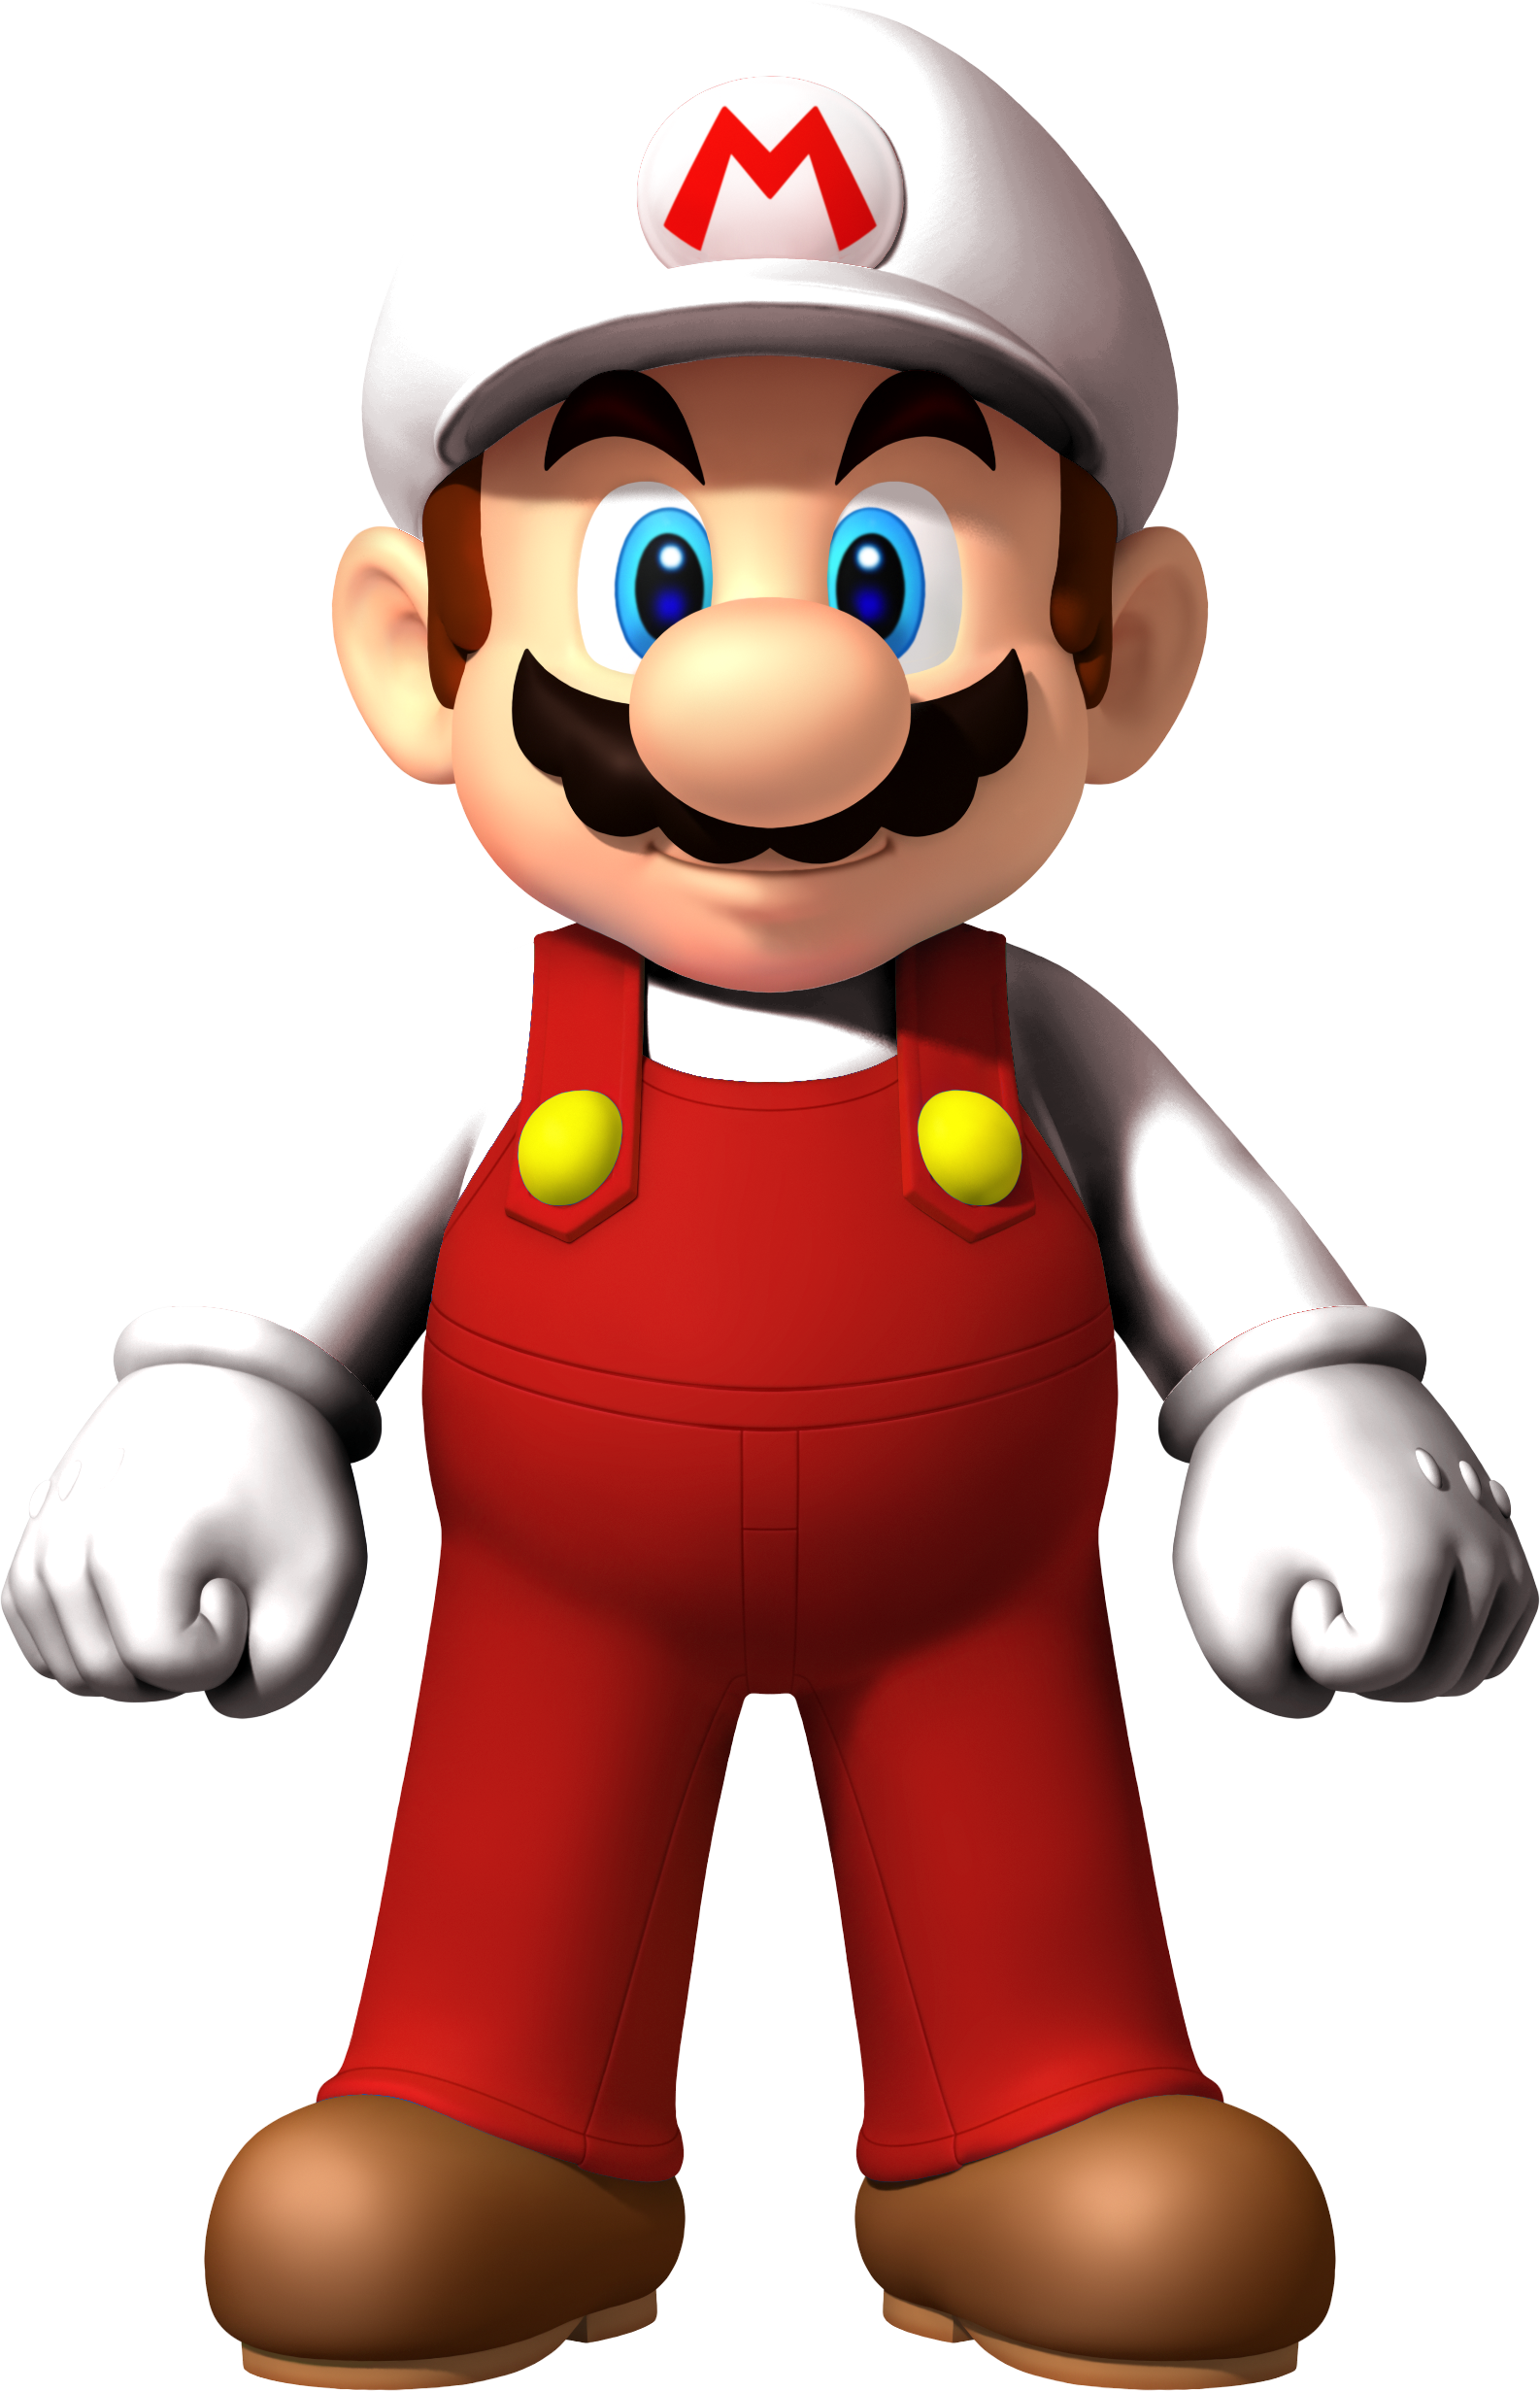 Mario clipart fire Sunnyboiiii Nintendo  More Wii)